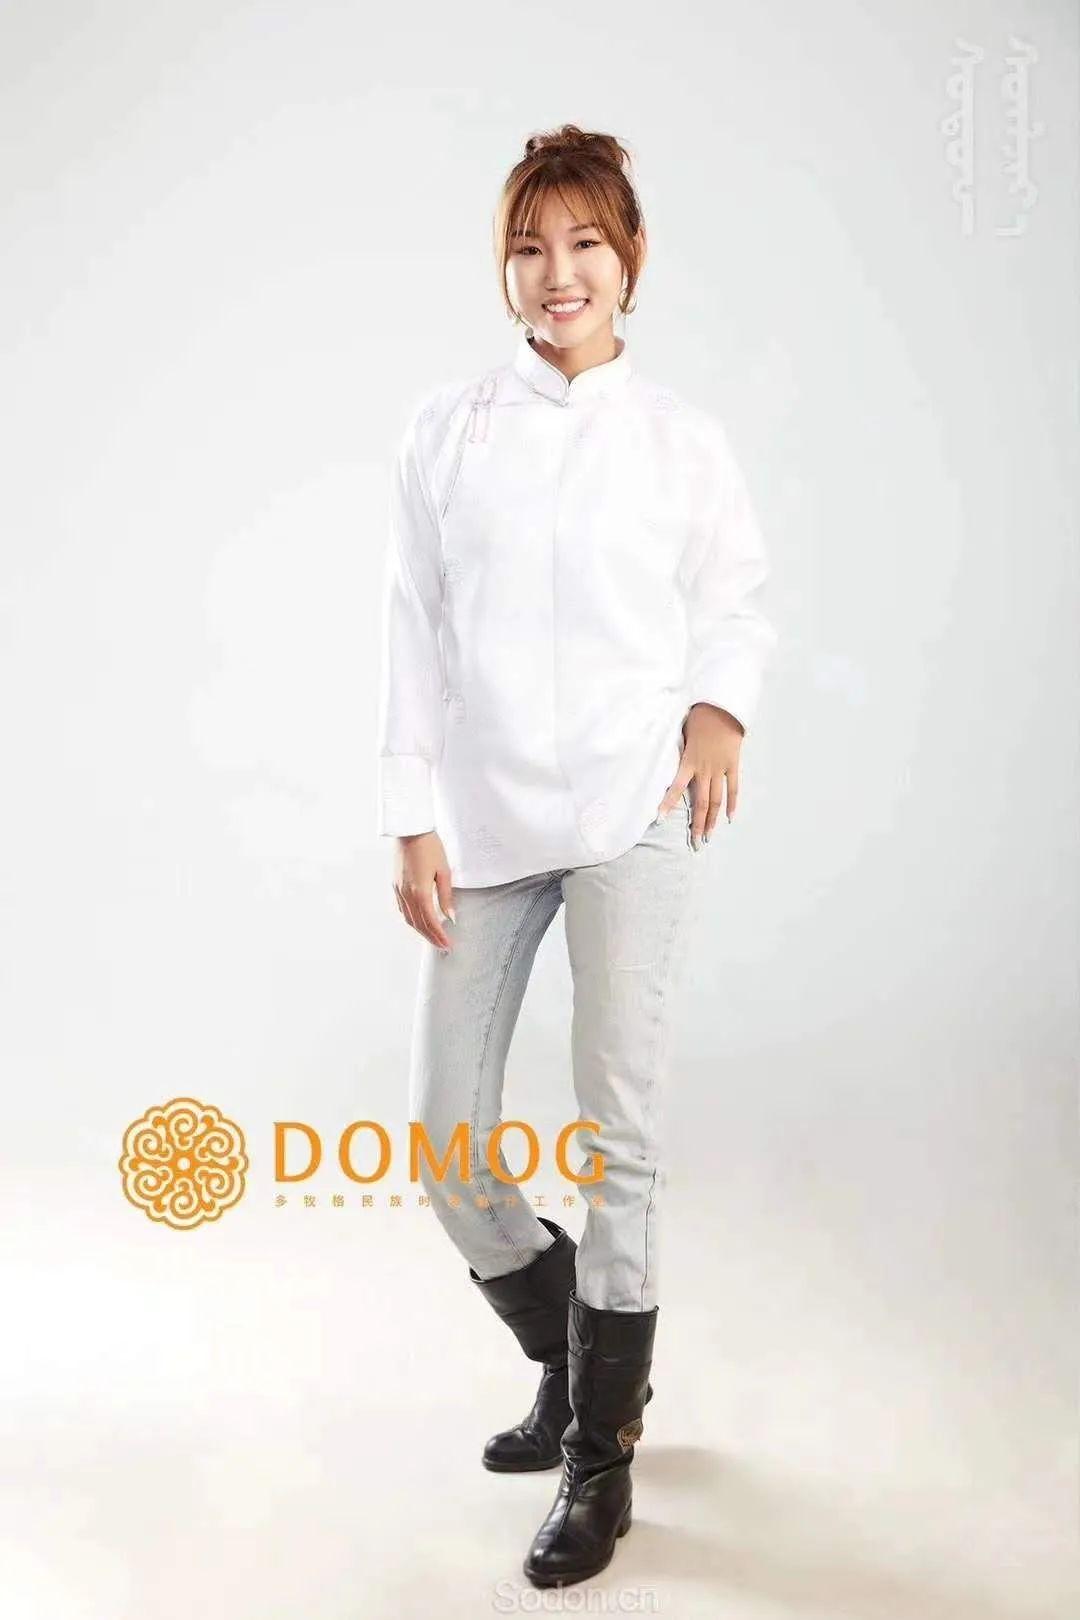 DOMOG 蒙古时装2020新款,民族与时尚的融合 第32张 DOMOG 蒙古时装2020新款,民族与时尚的融合 蒙古服饰